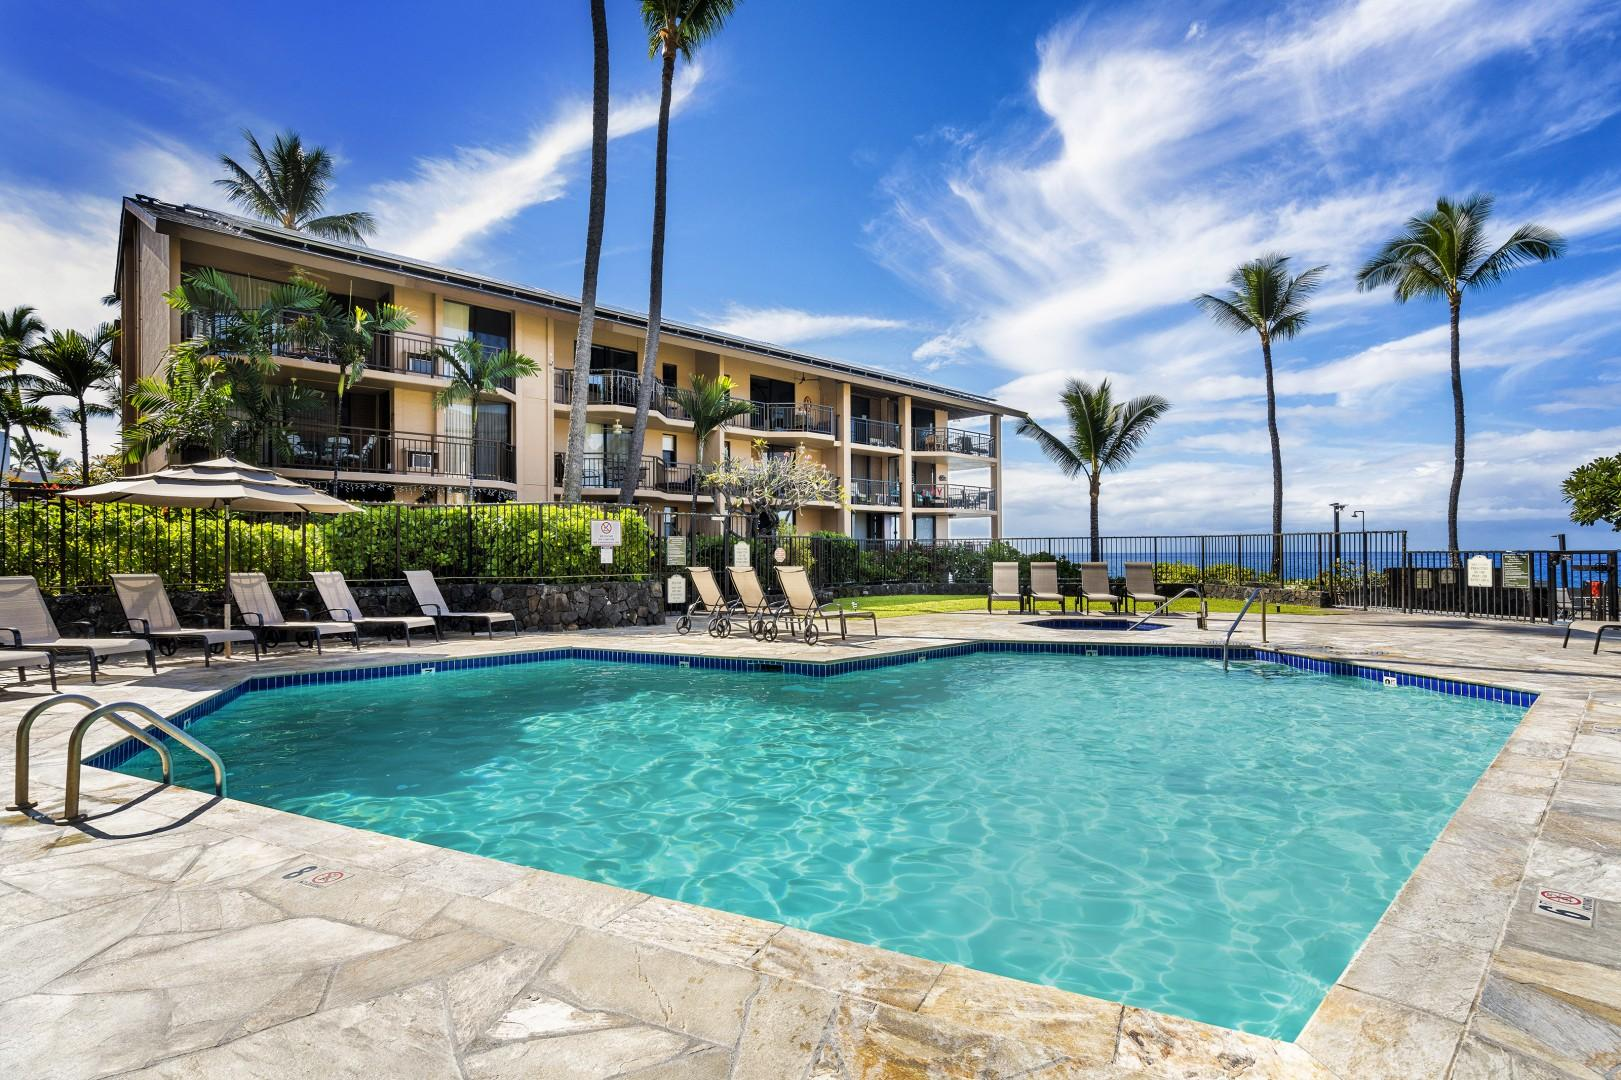 Kona Makai Pool with coastal views